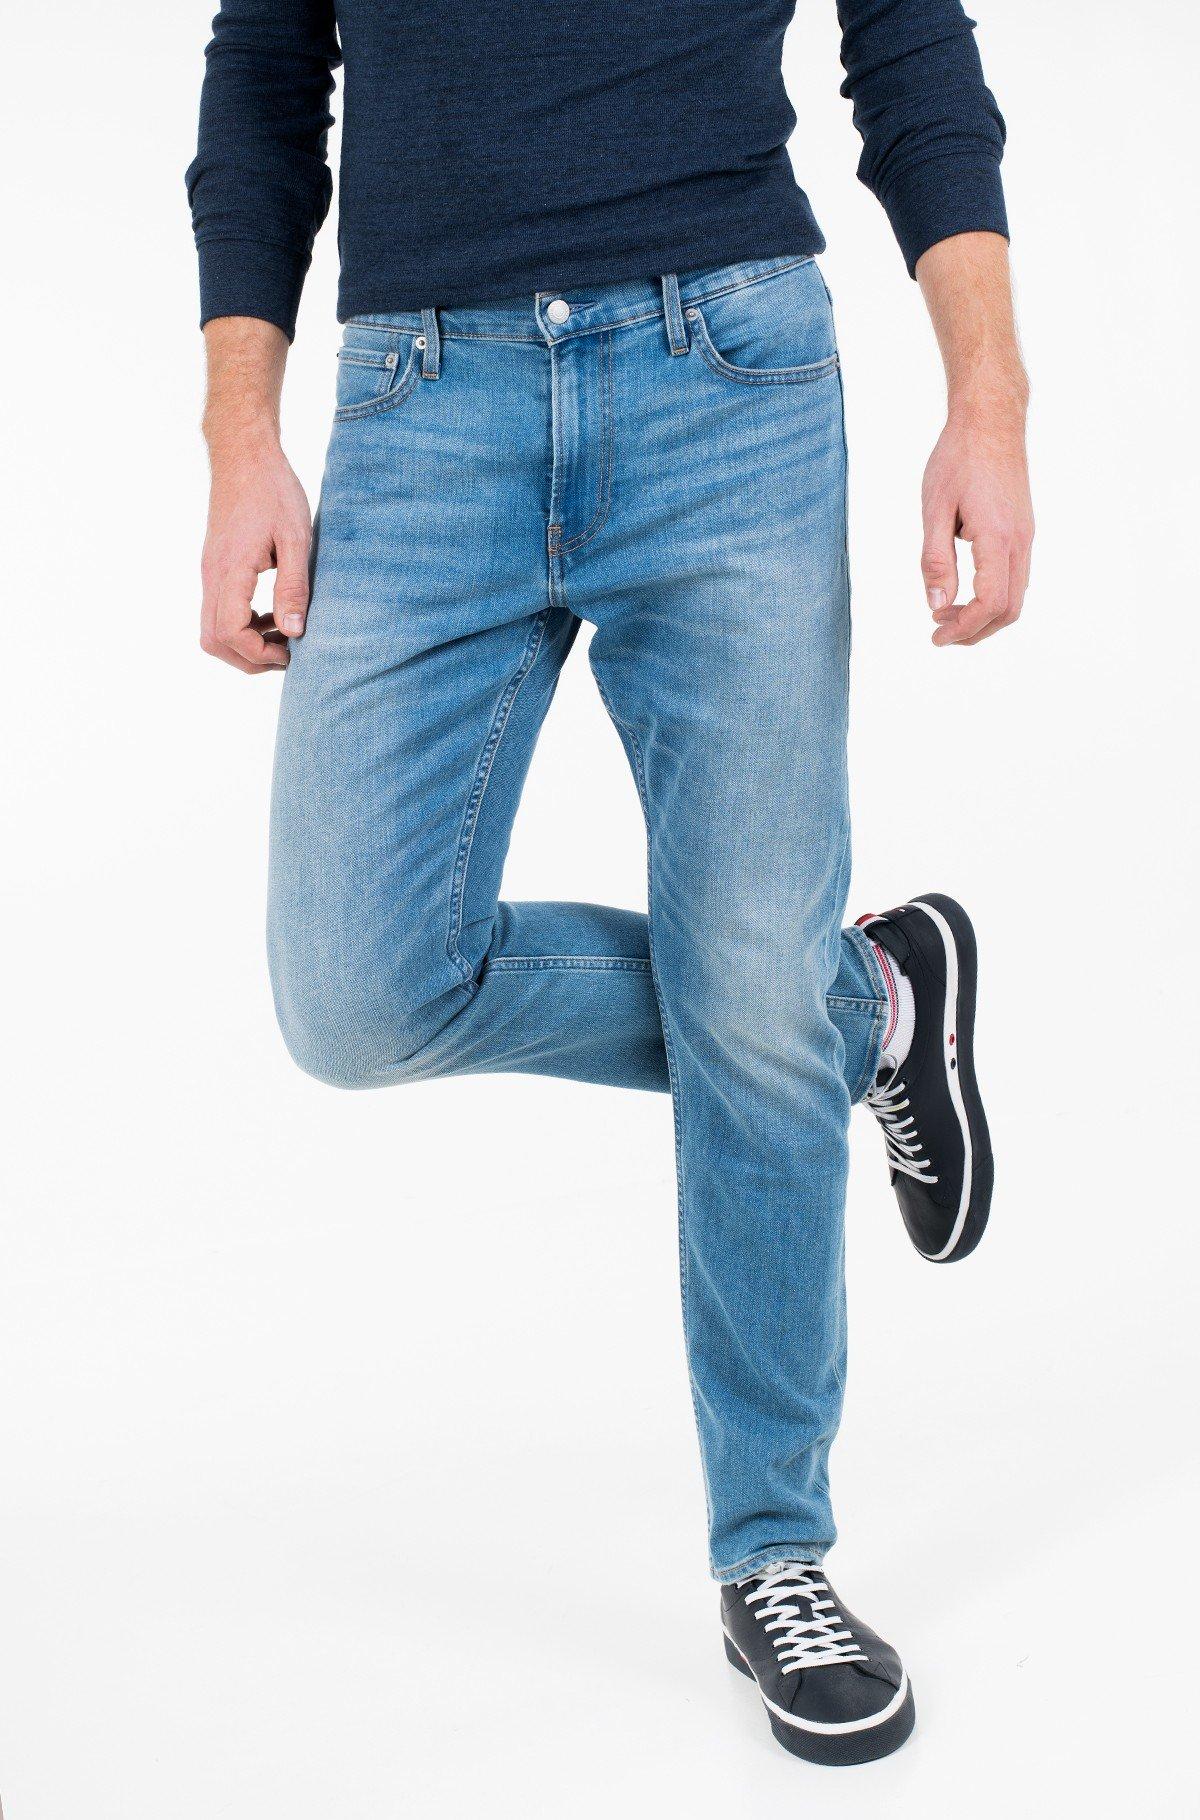 Jeans CKJ 026 SLIM-full-1